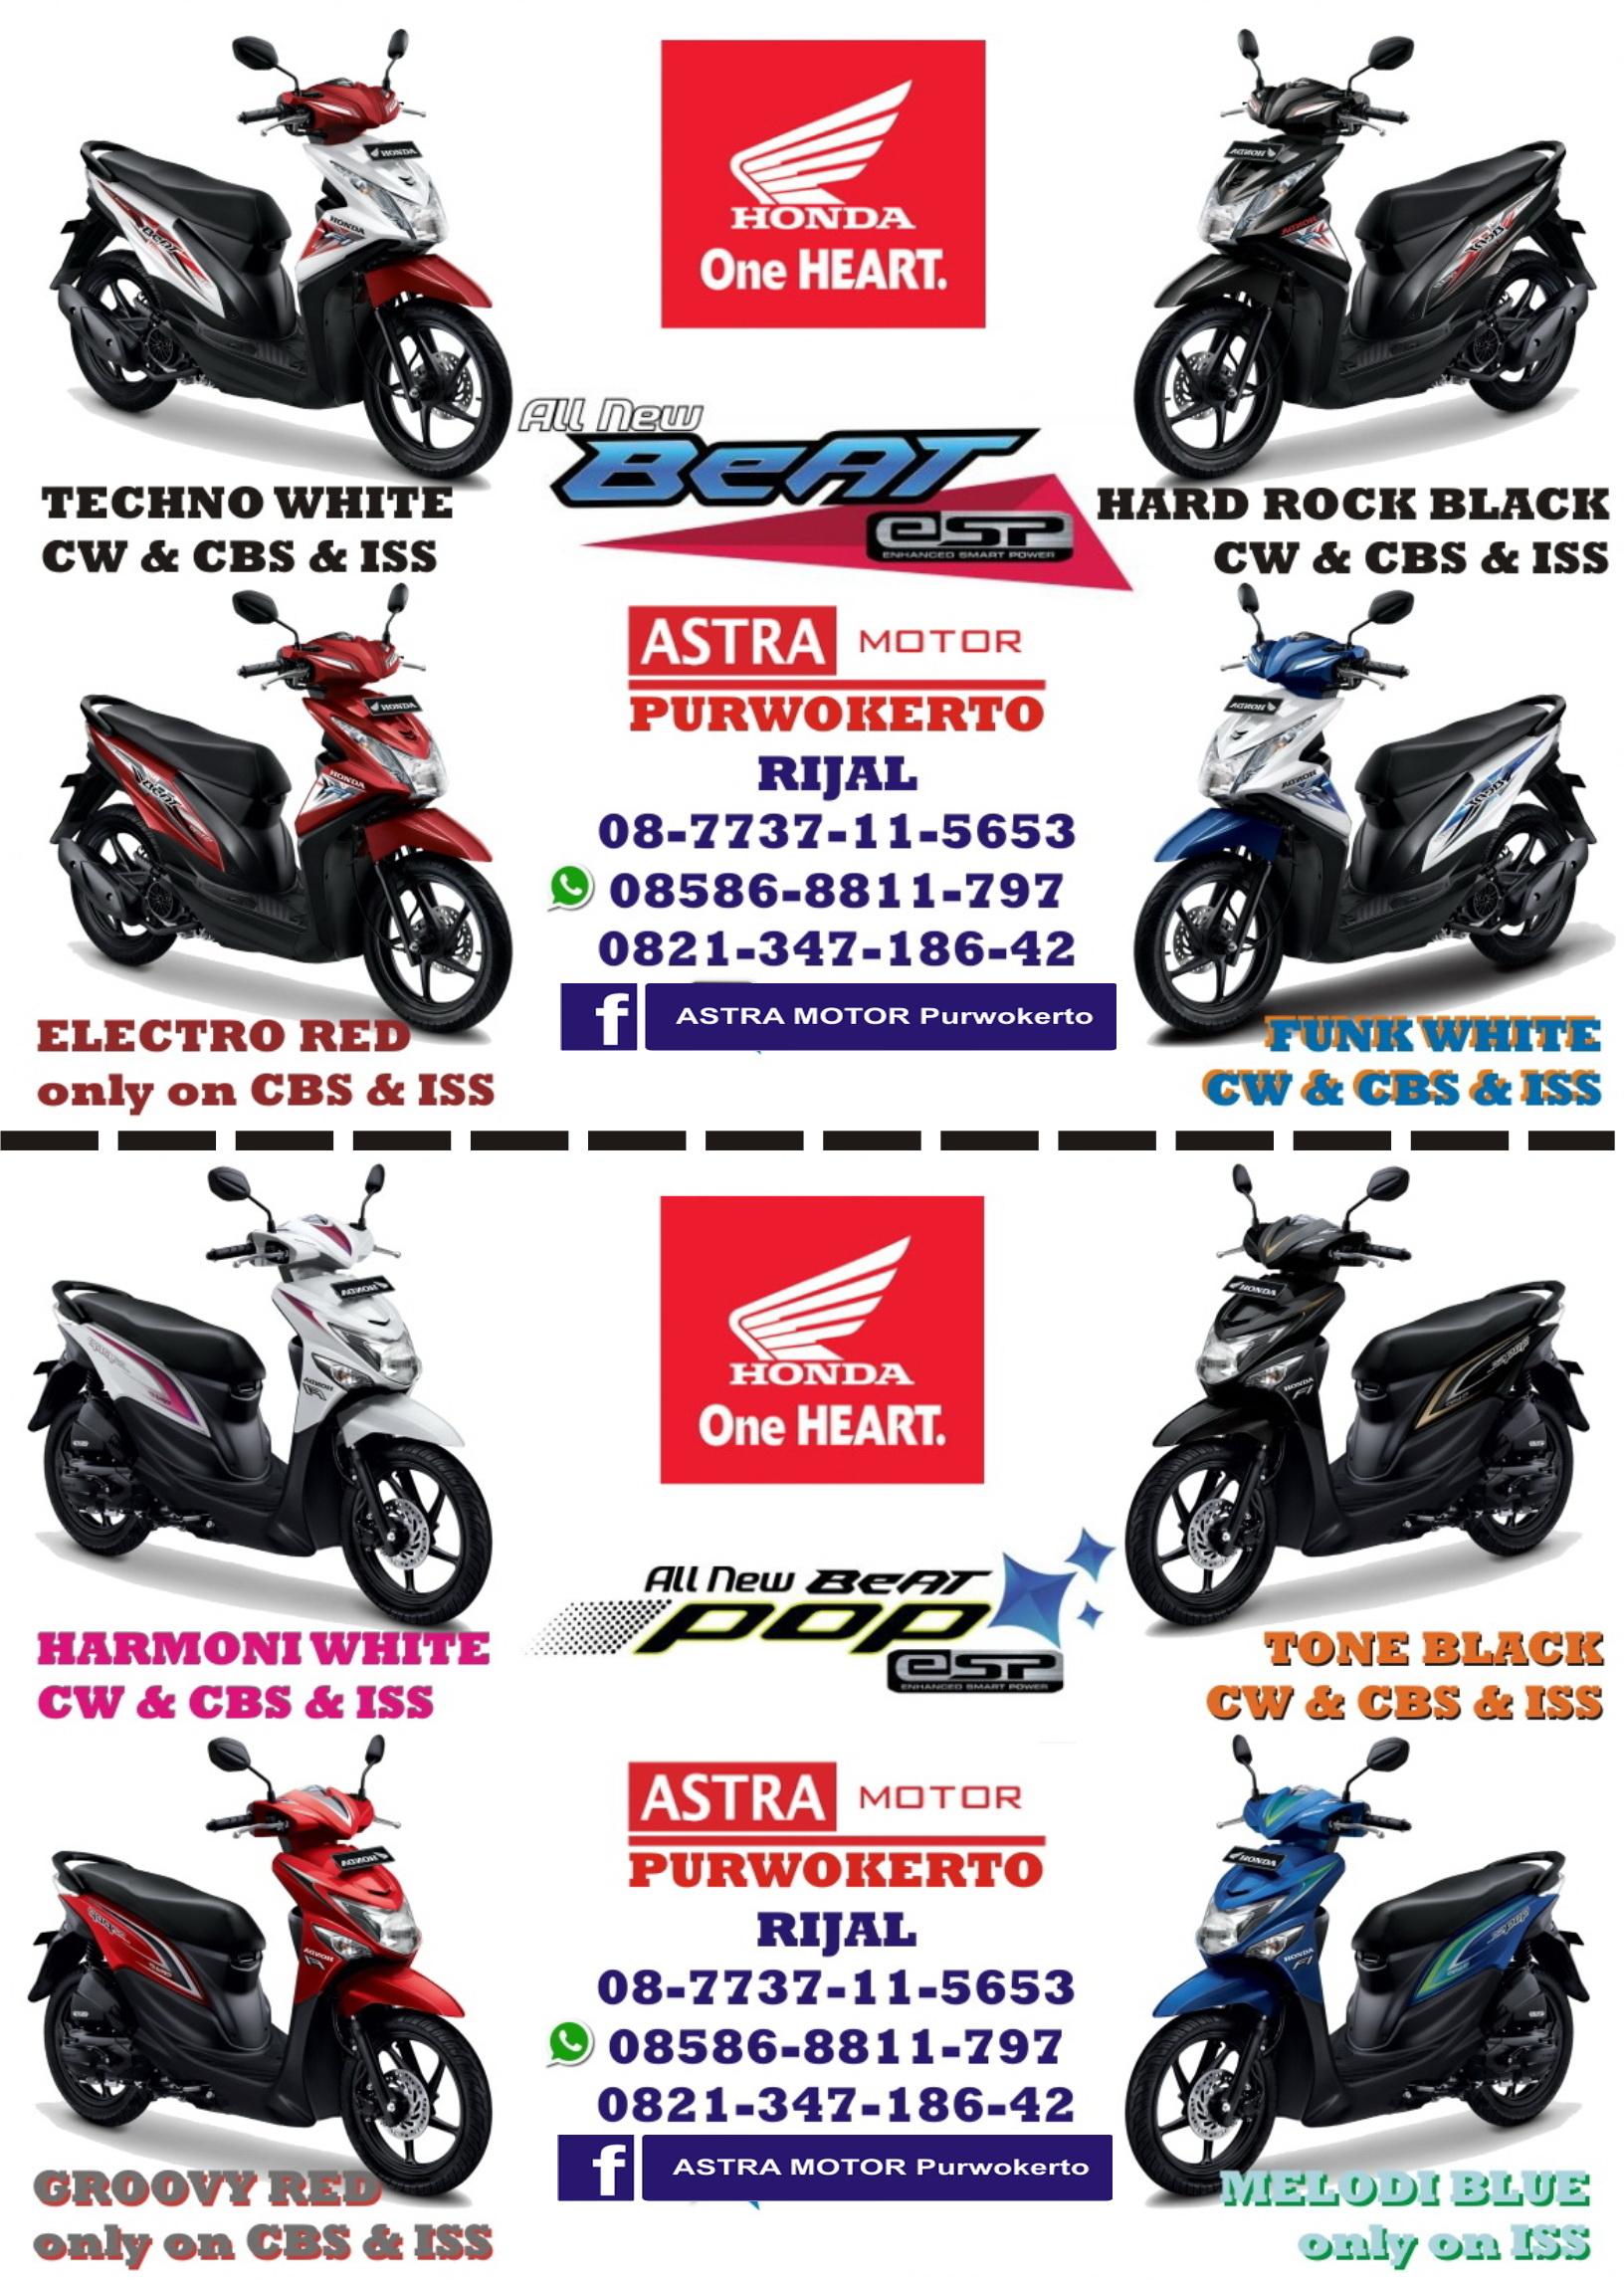 Lowongan Pekerjaan Daerah Purwokerto Find Job Vacancies In Indonesia Jobsdb Indonesia 1632 X 2293 Jpeg 877kb Motor All New Honda Beat Esp Sporty Dan All